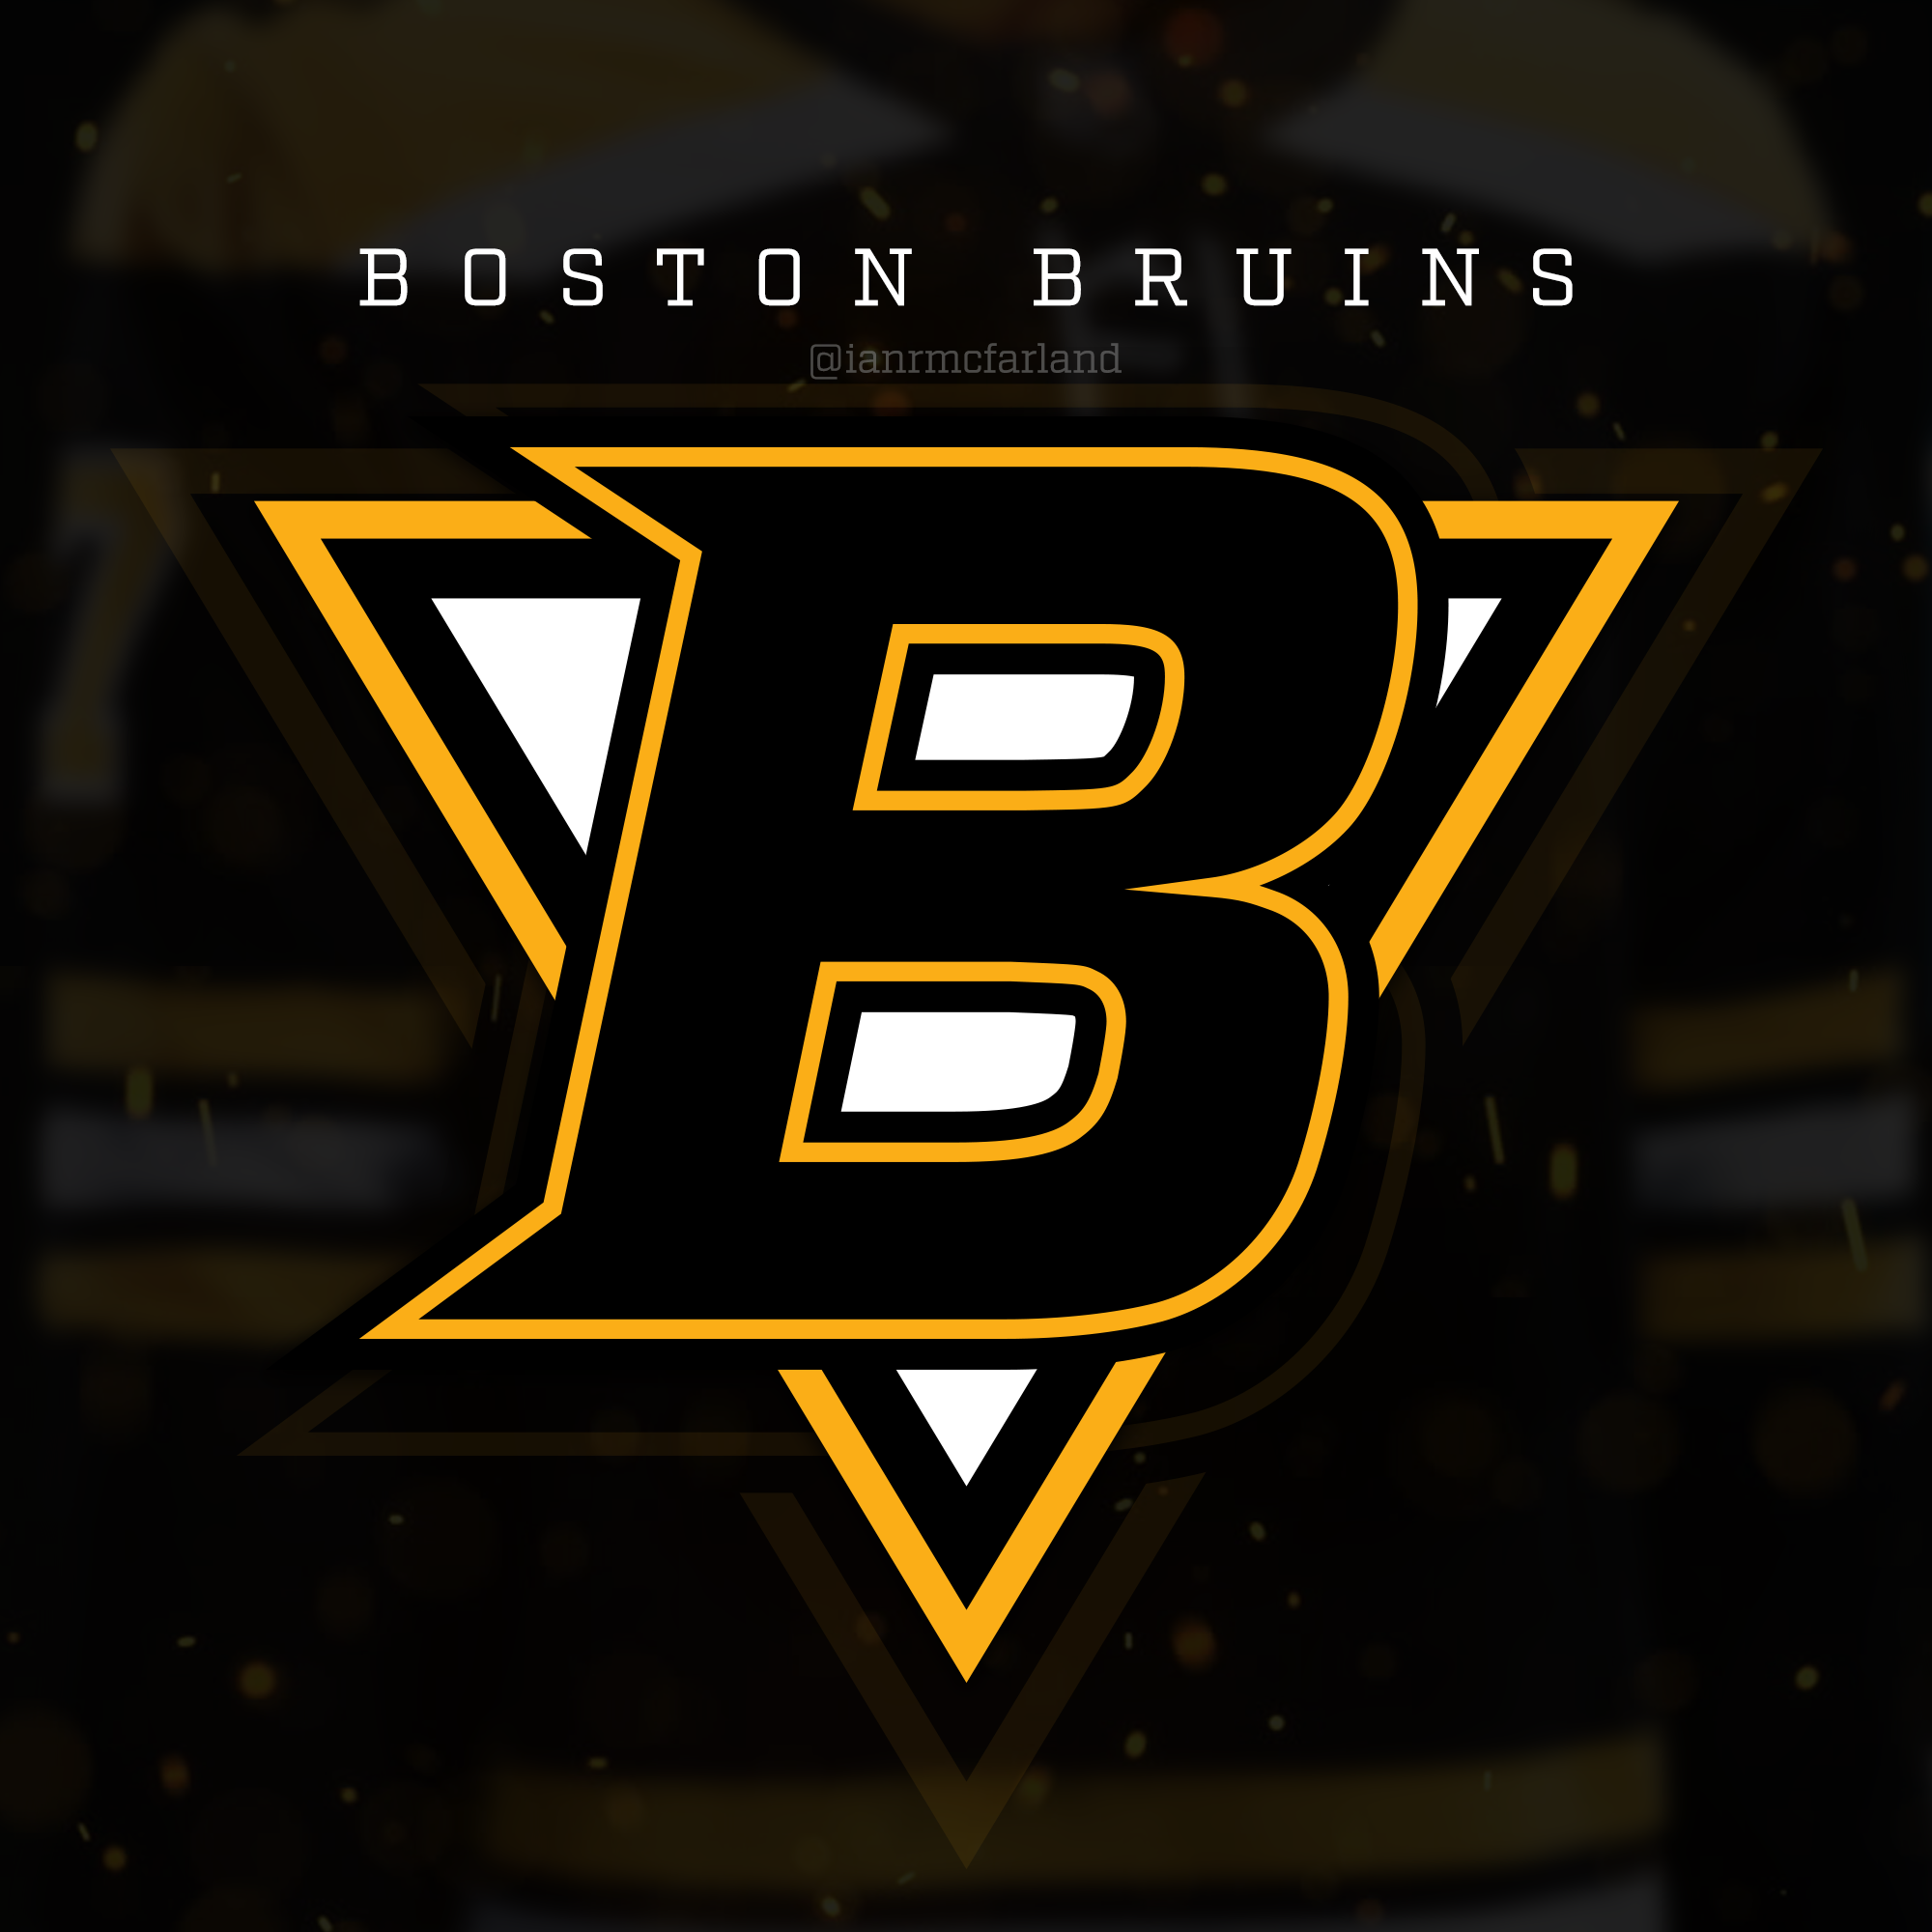 Boston bruins logo redesign concept concepts chris creamers bostonbruinsmockupg voltagebd Image collections